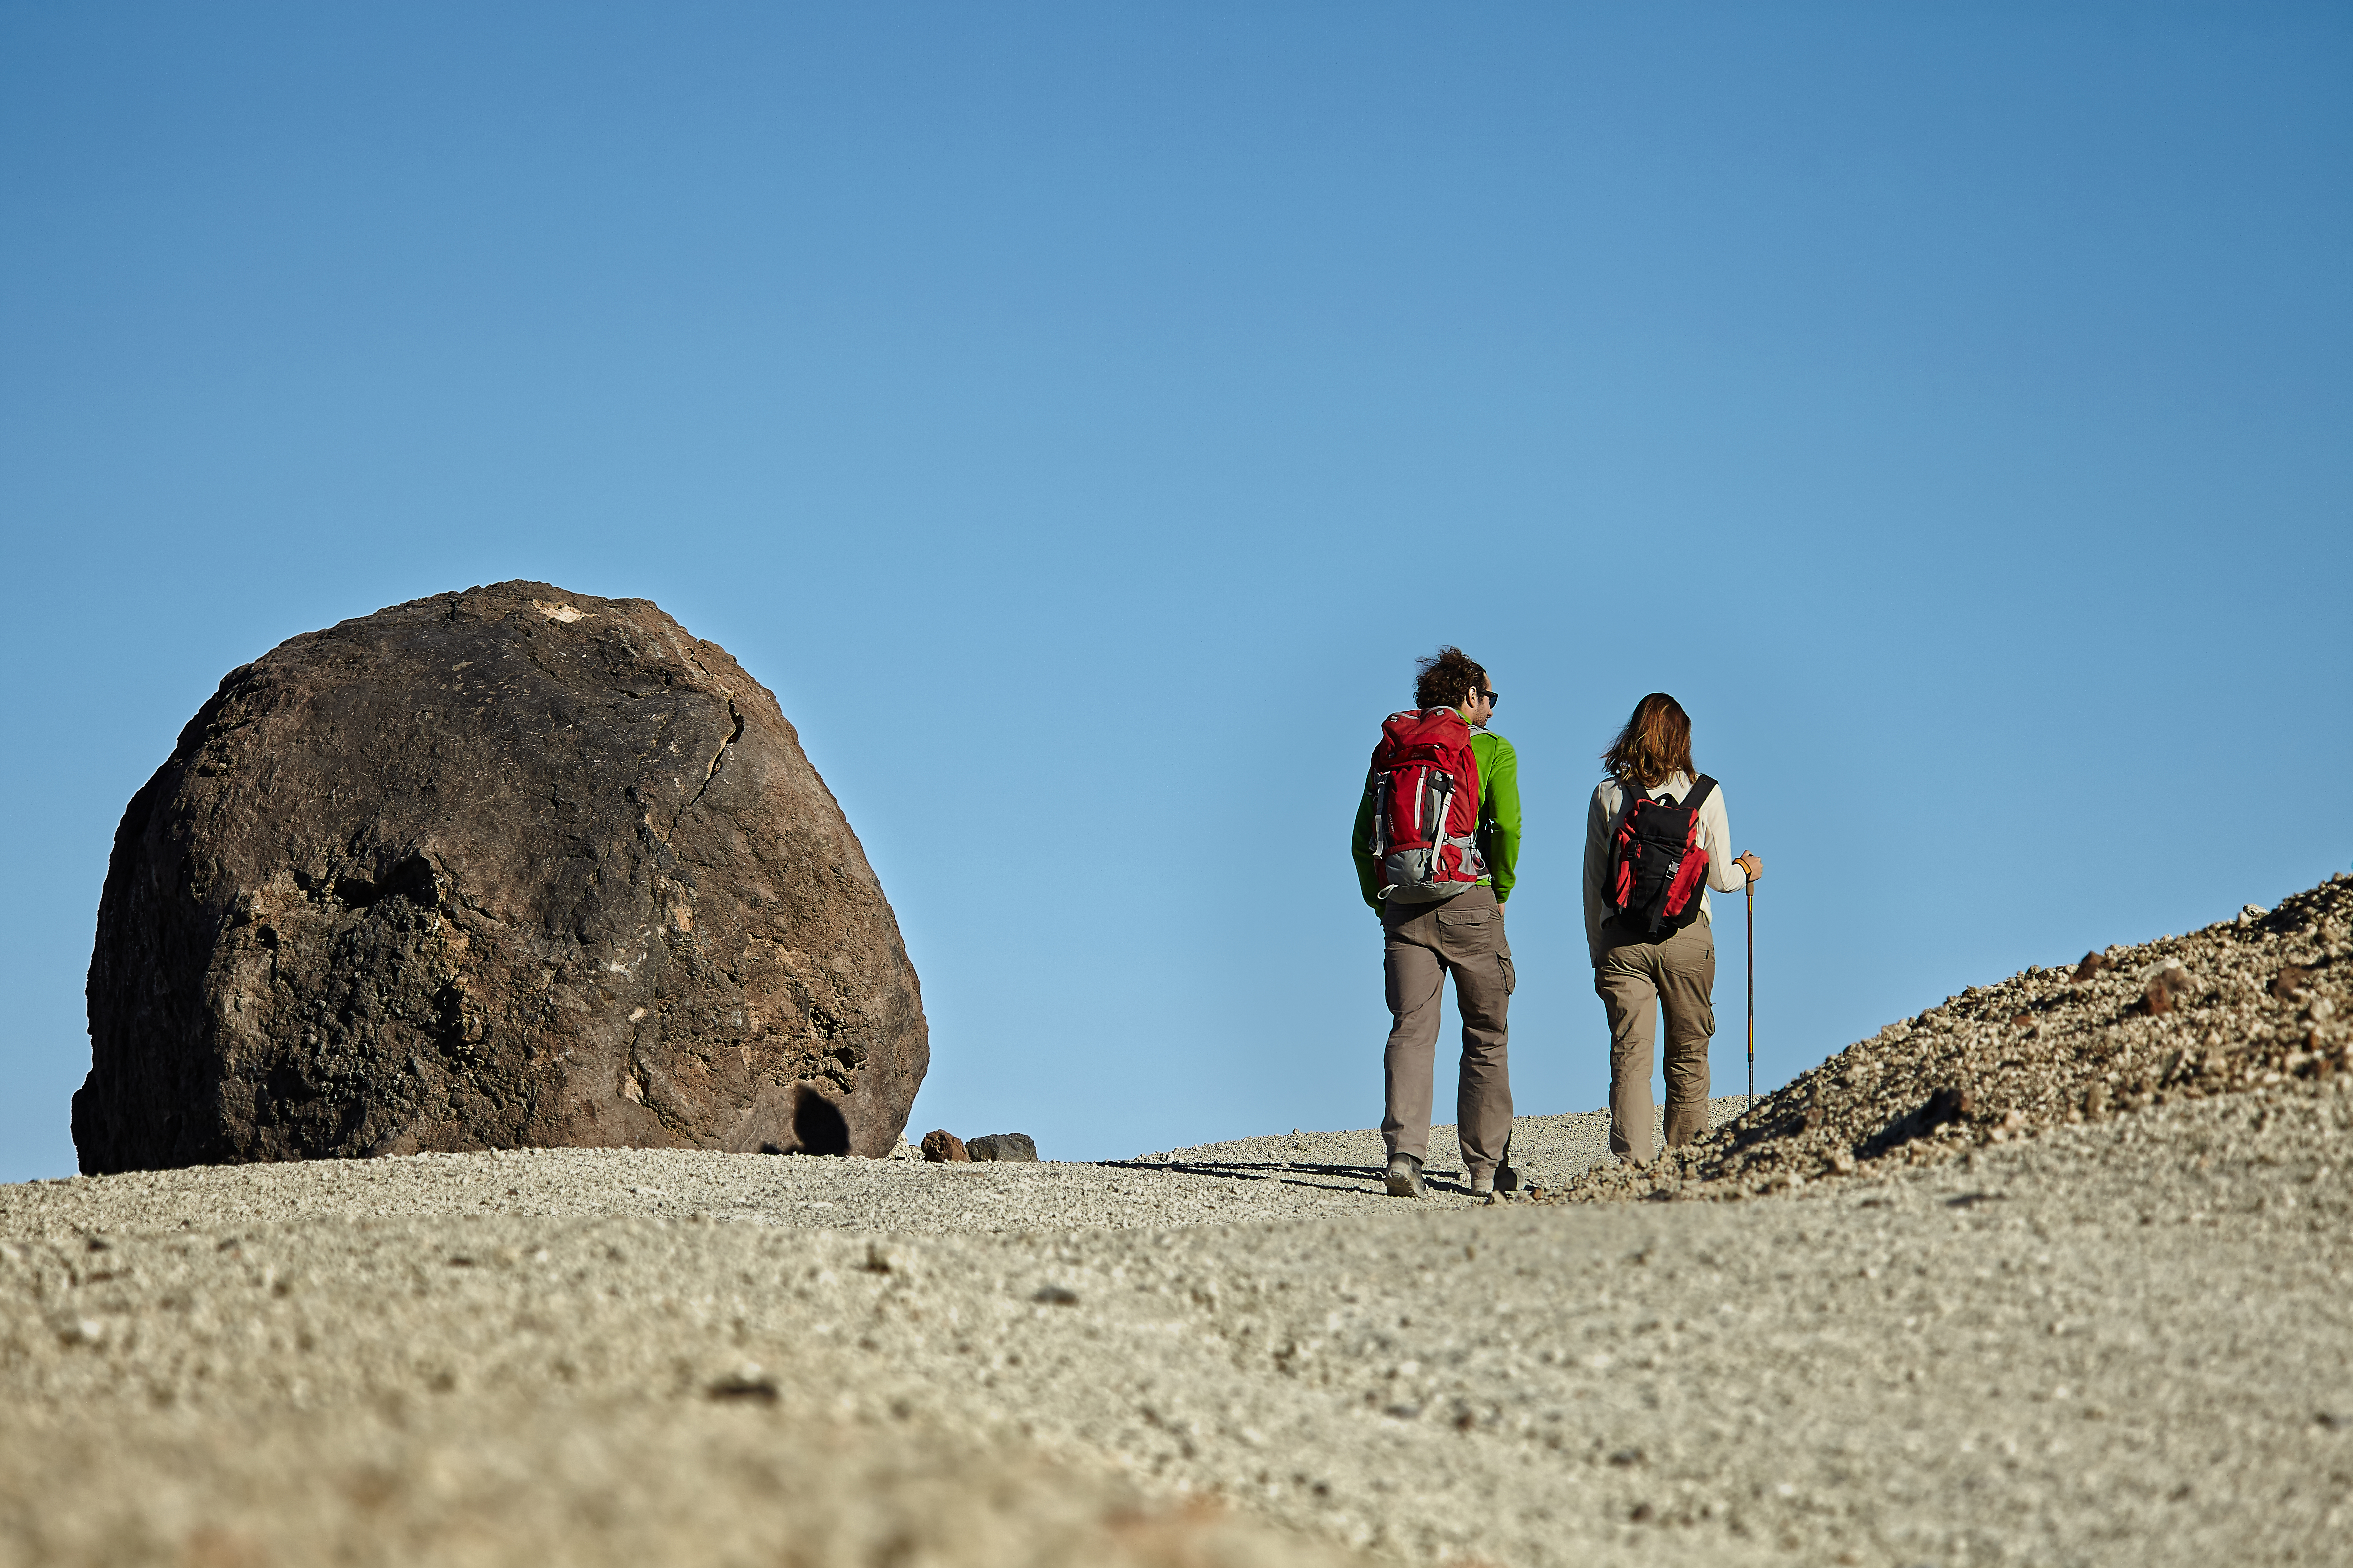 Salita a piedi al Teide lungo il sentiero di Montaña Blanca